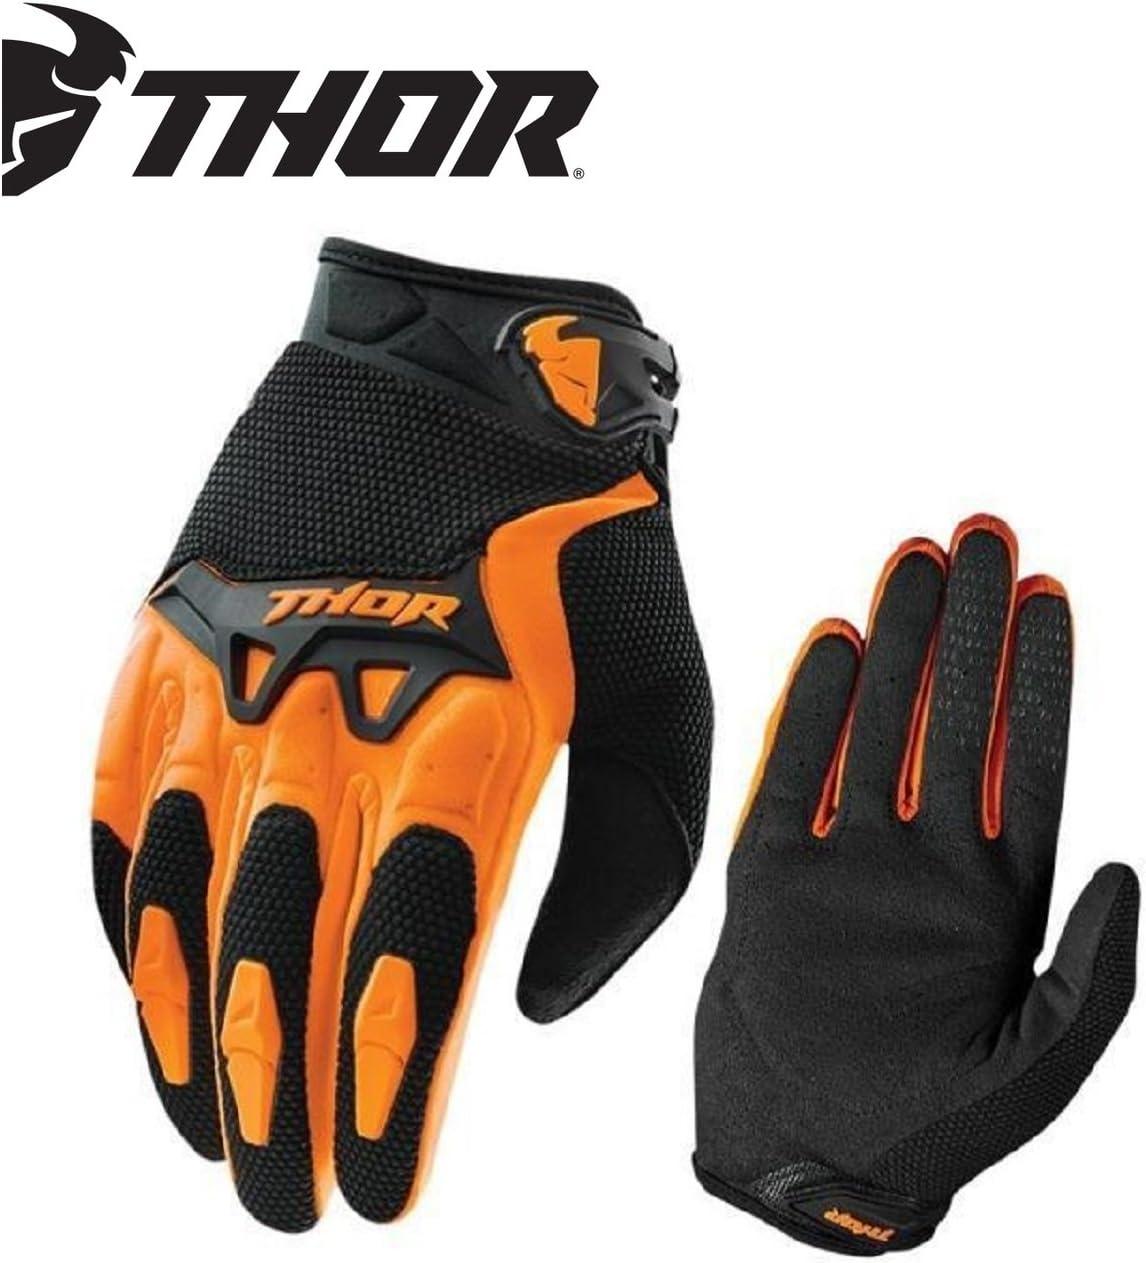 Thor Youth Spectrum Gloves MX Motocross Dirt Bike Off-Road ATV MTB Boys Gear